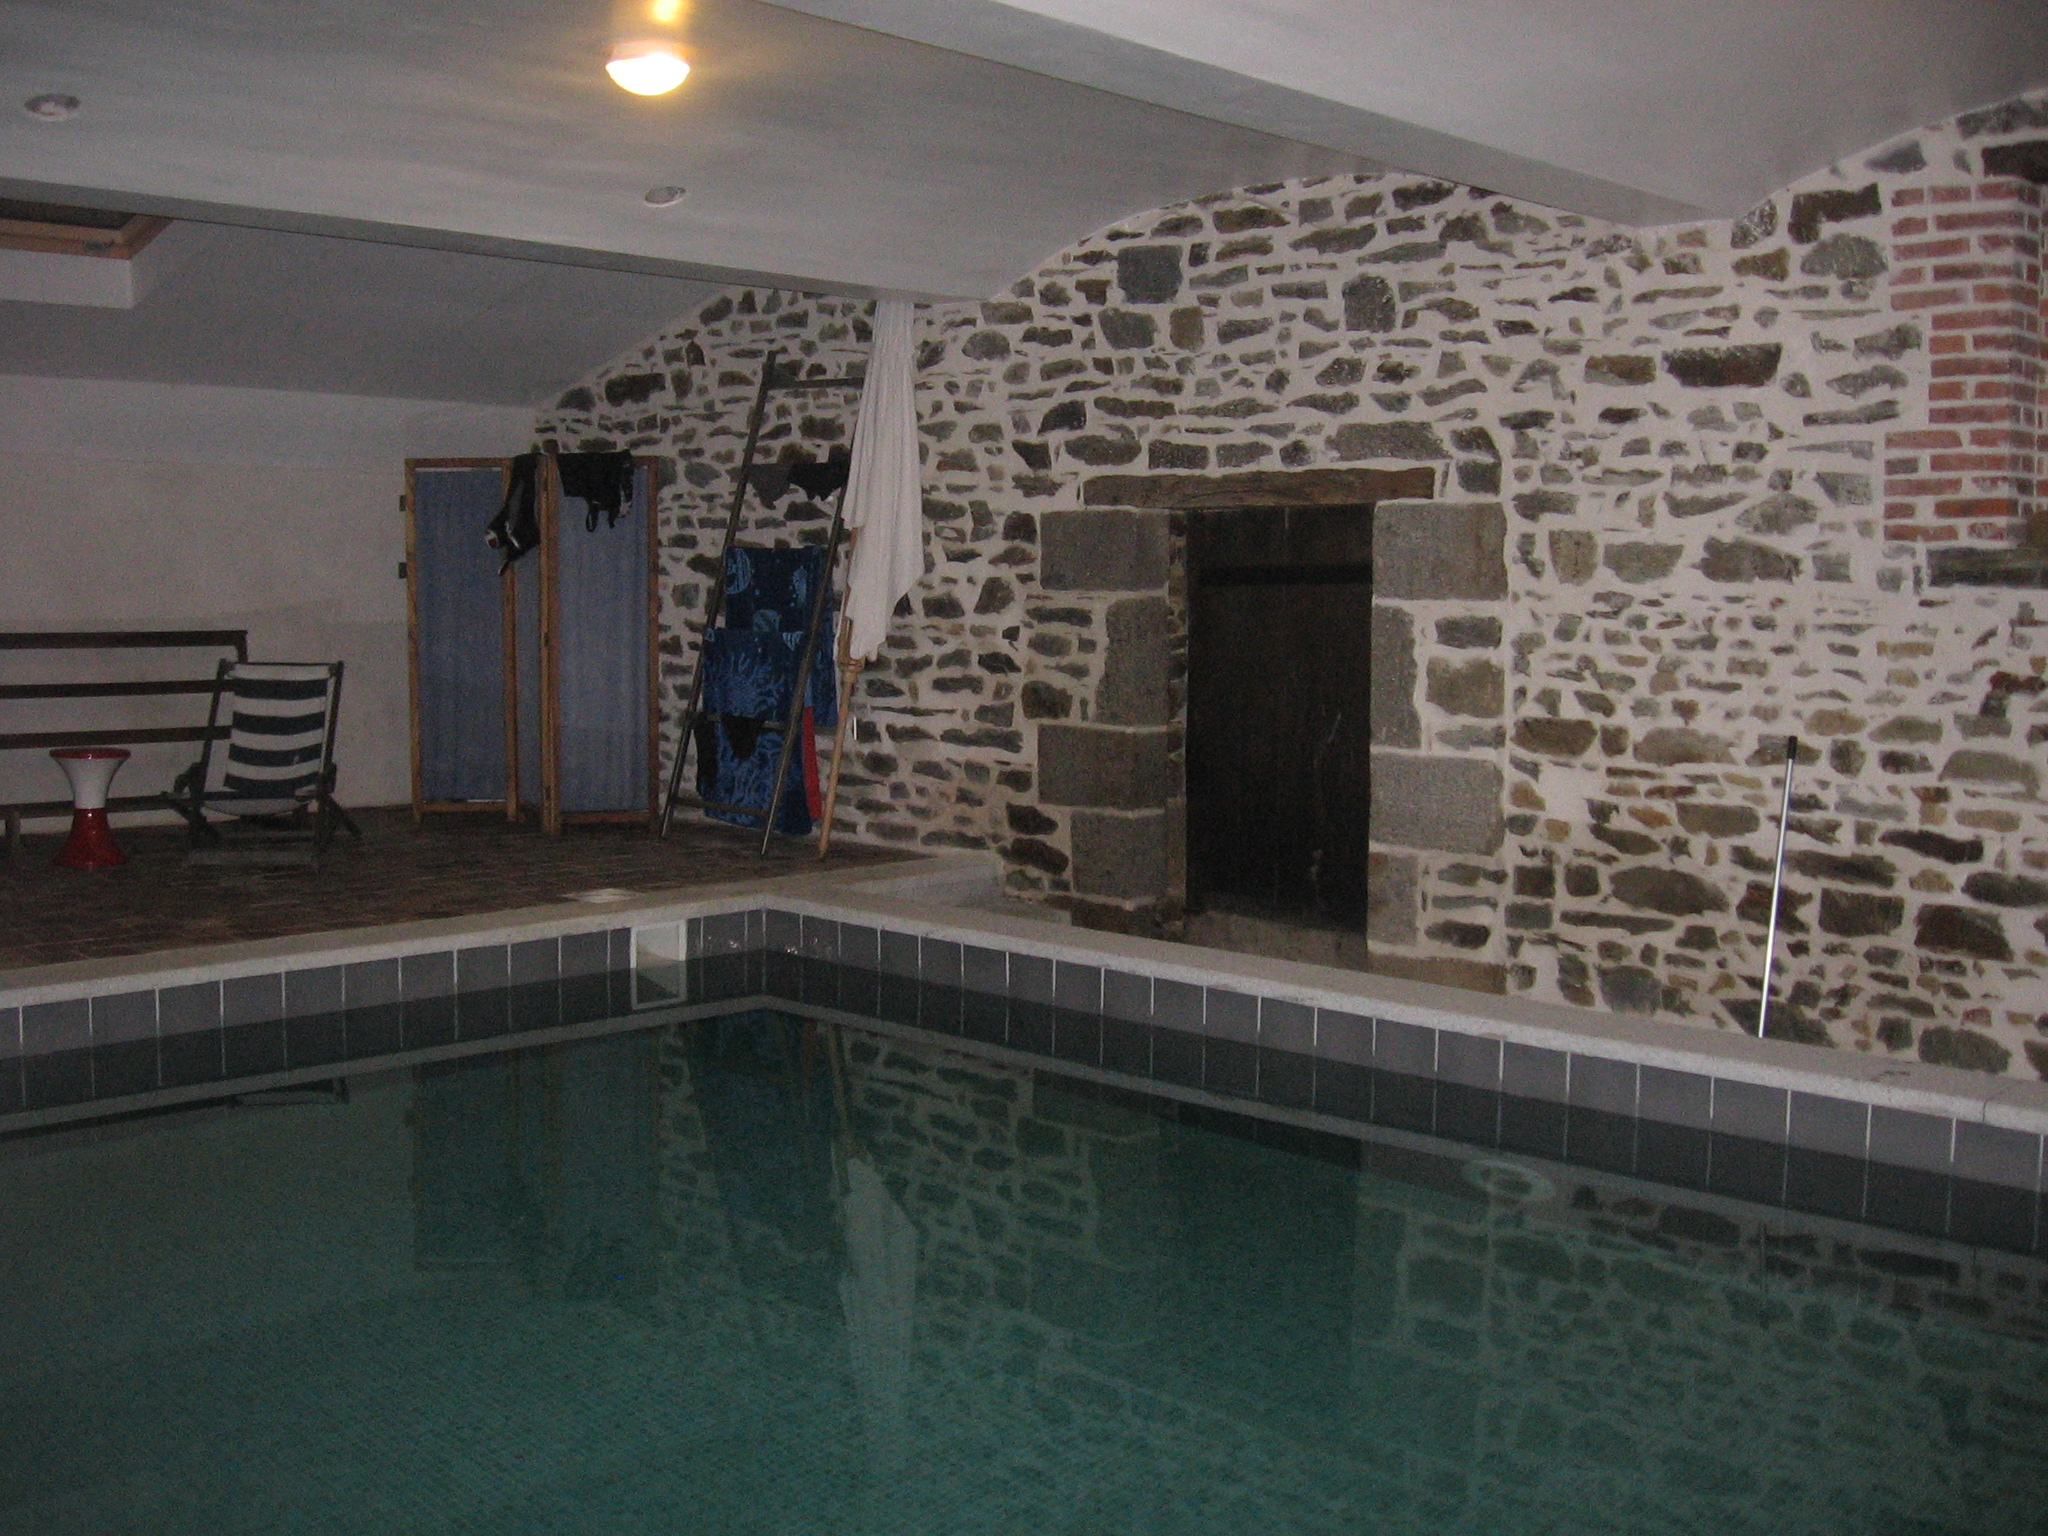 Le Gargouille - Townhouses For Rent In Boistrudan, Brittany ... tout Piscine Janze